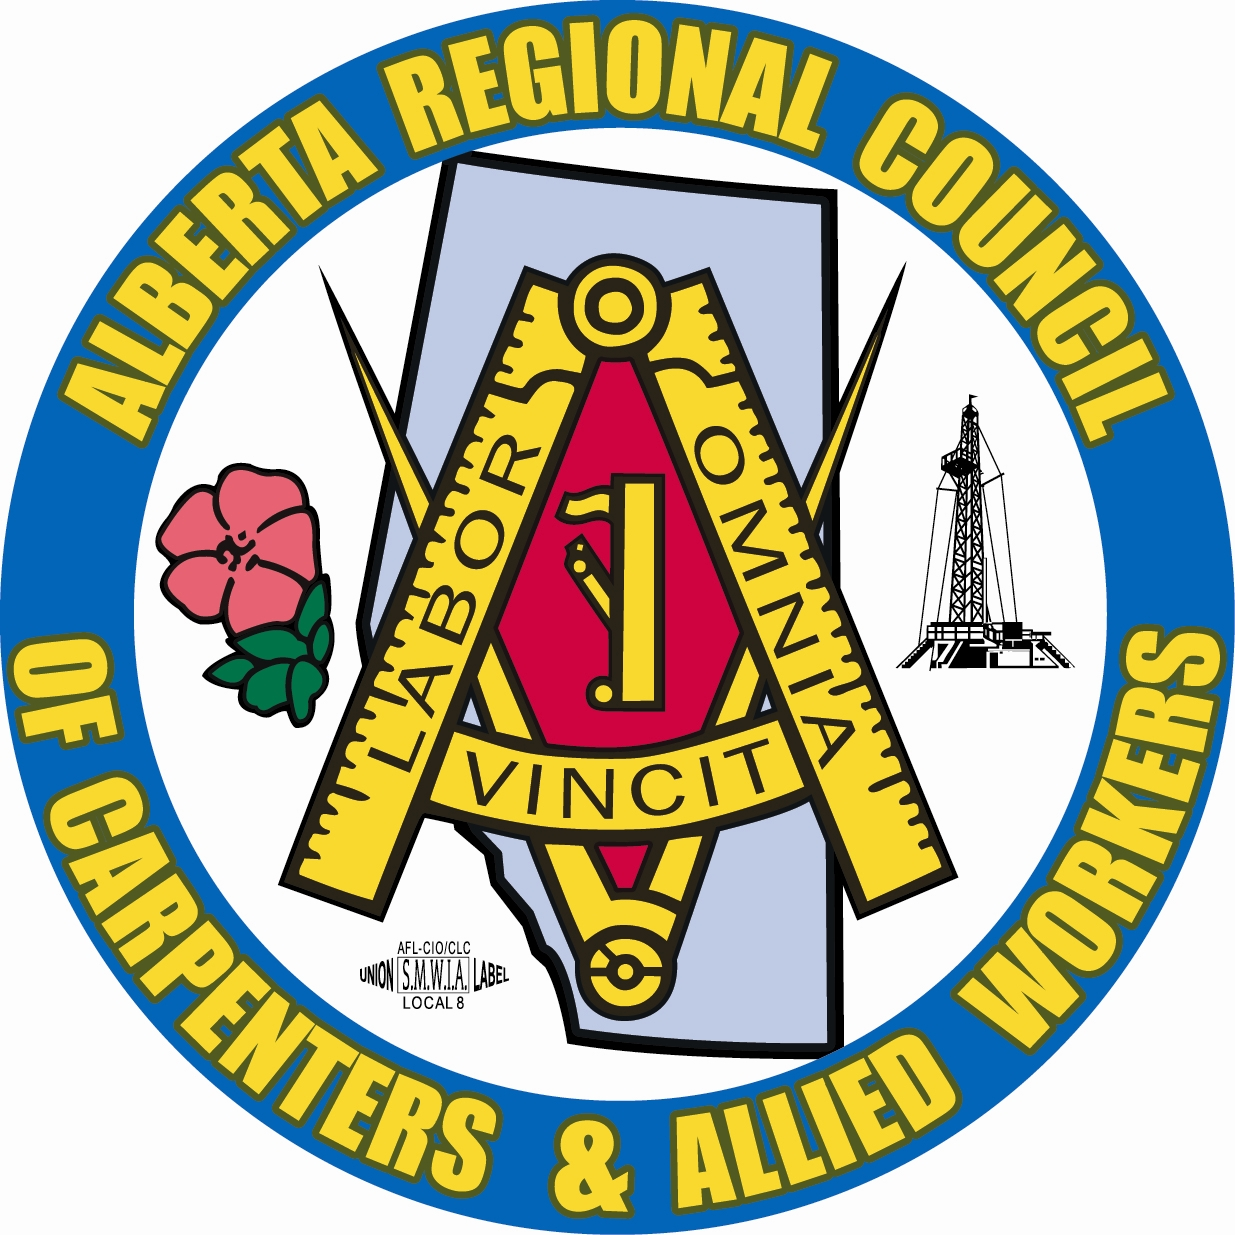 Albrta_Regional_Council.JPG